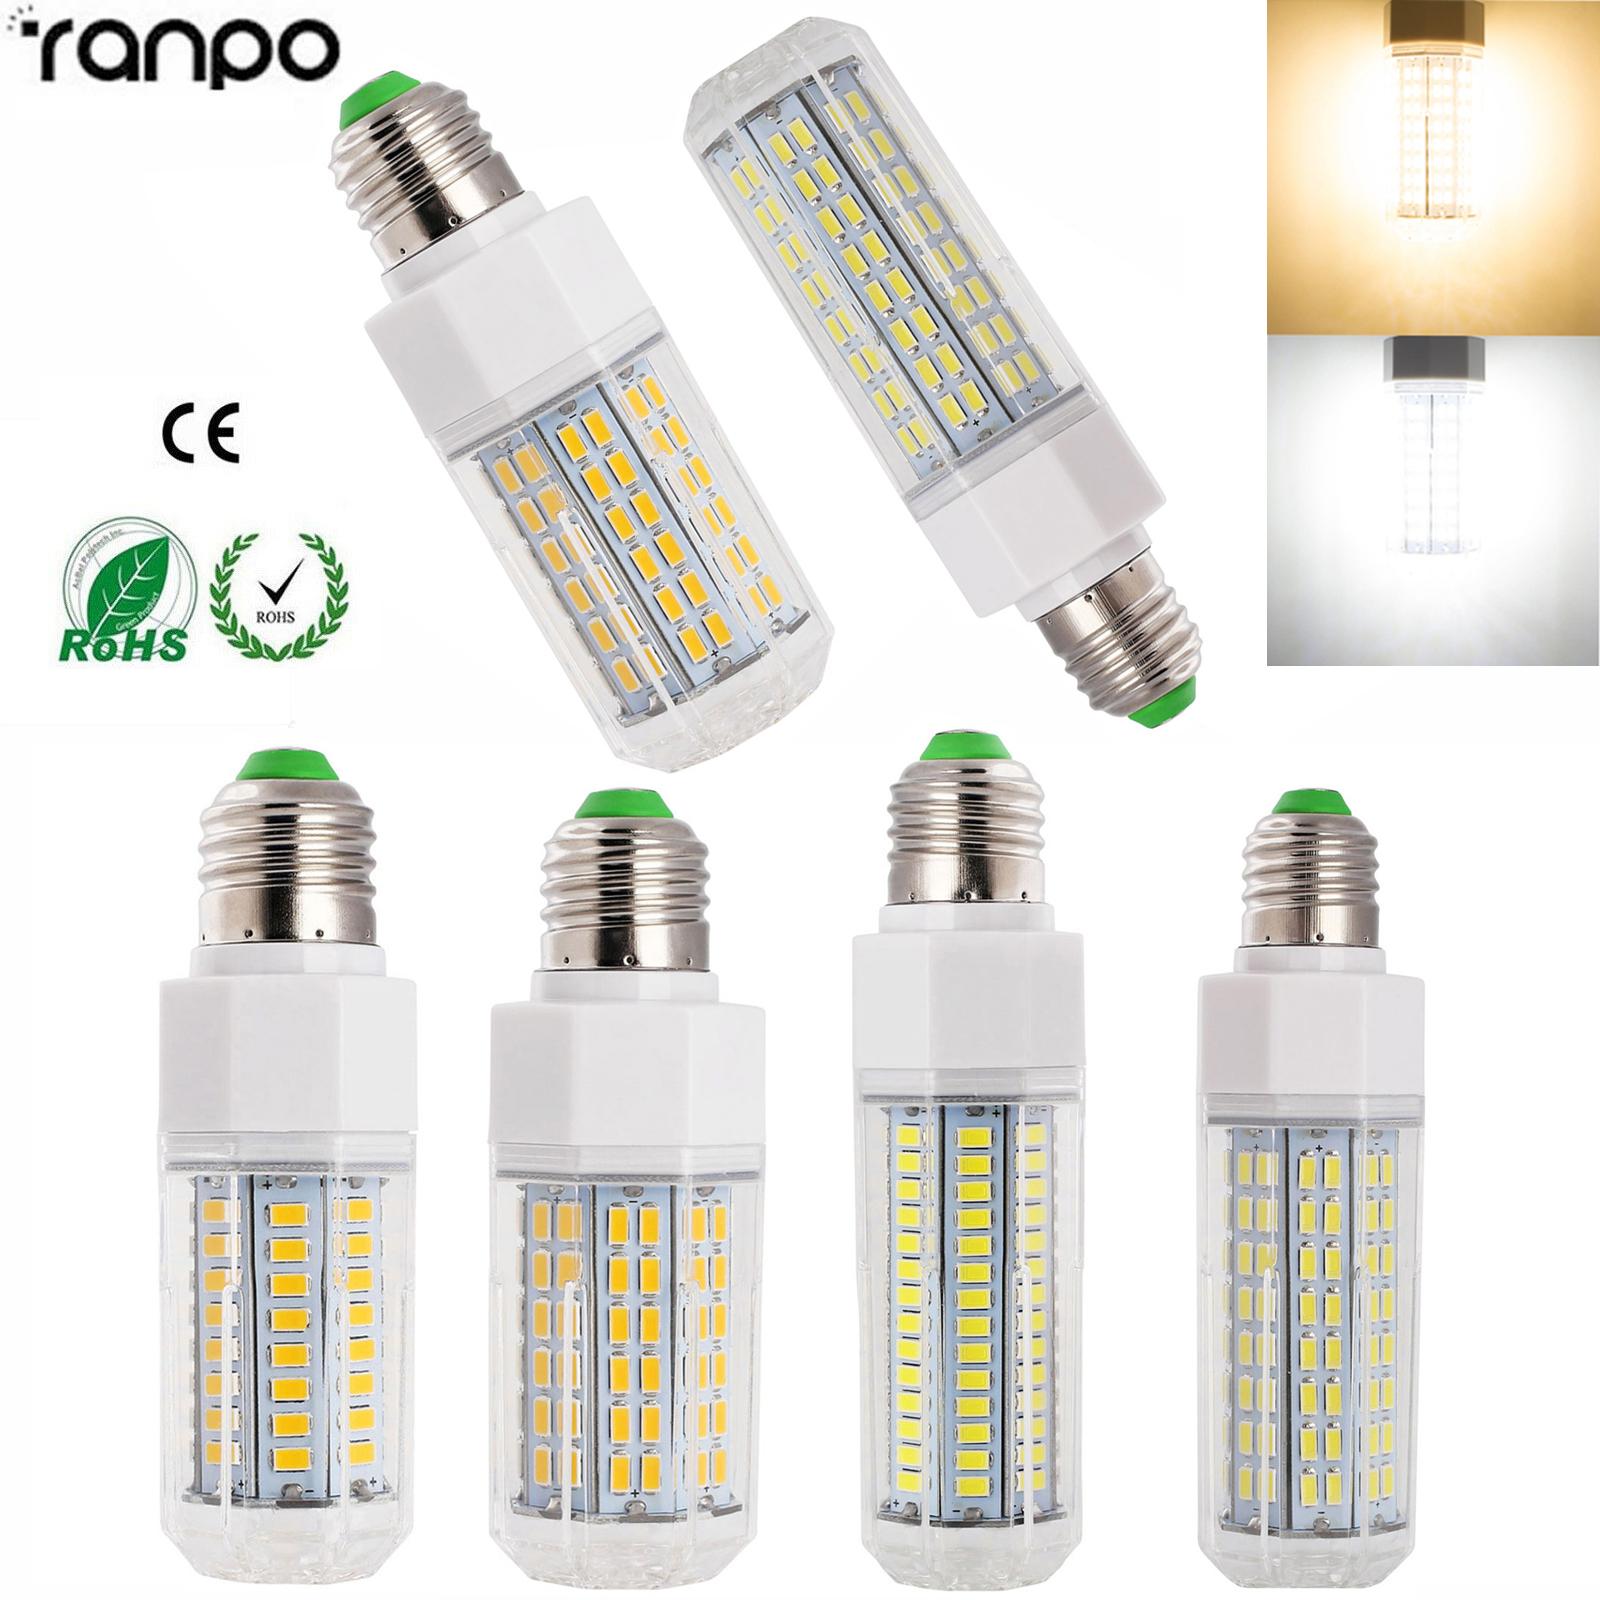 2pcs G4 LED Lampen Hohe Helligkeit SMD2835 LED Birne ersetzen Halogen X